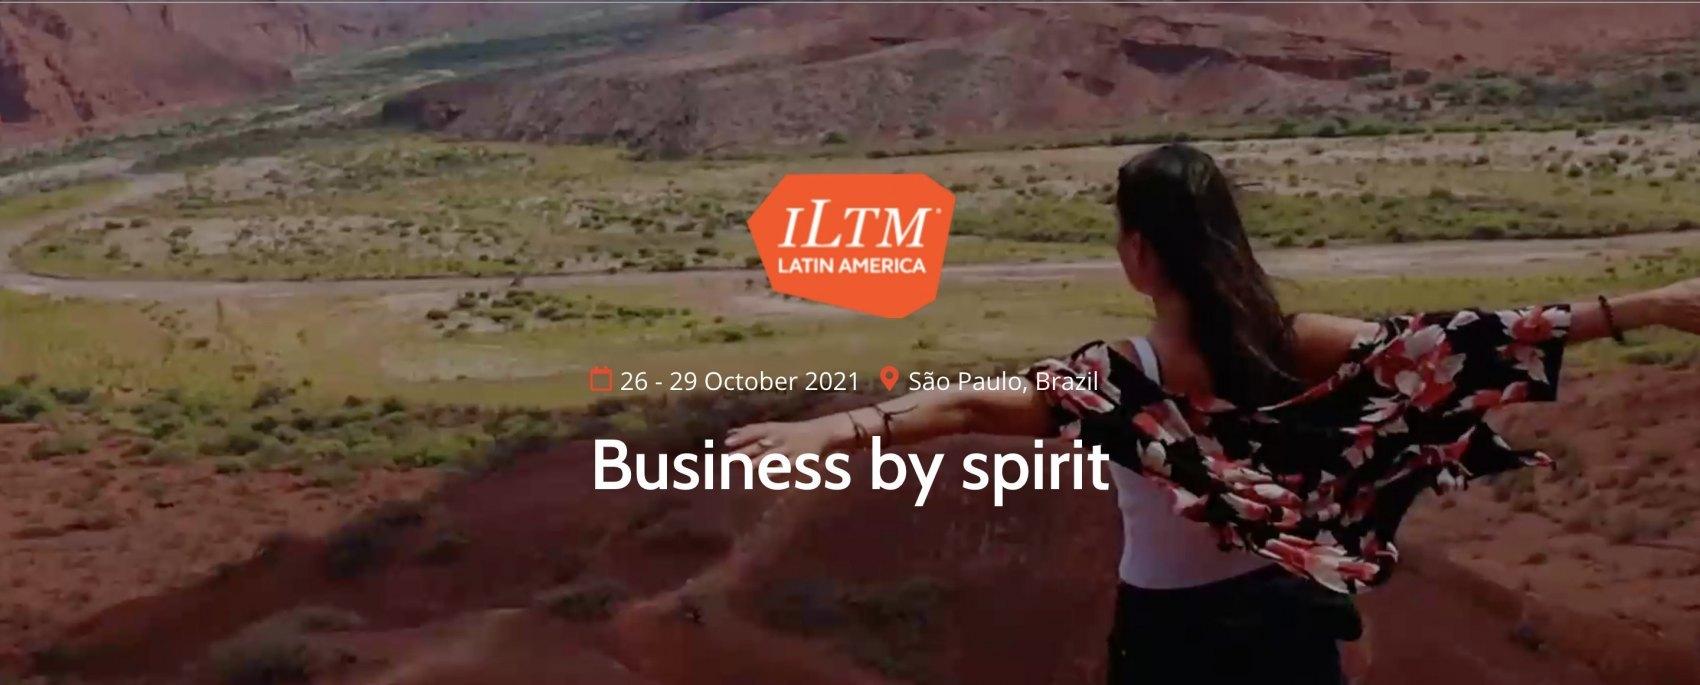 ILTM Conference